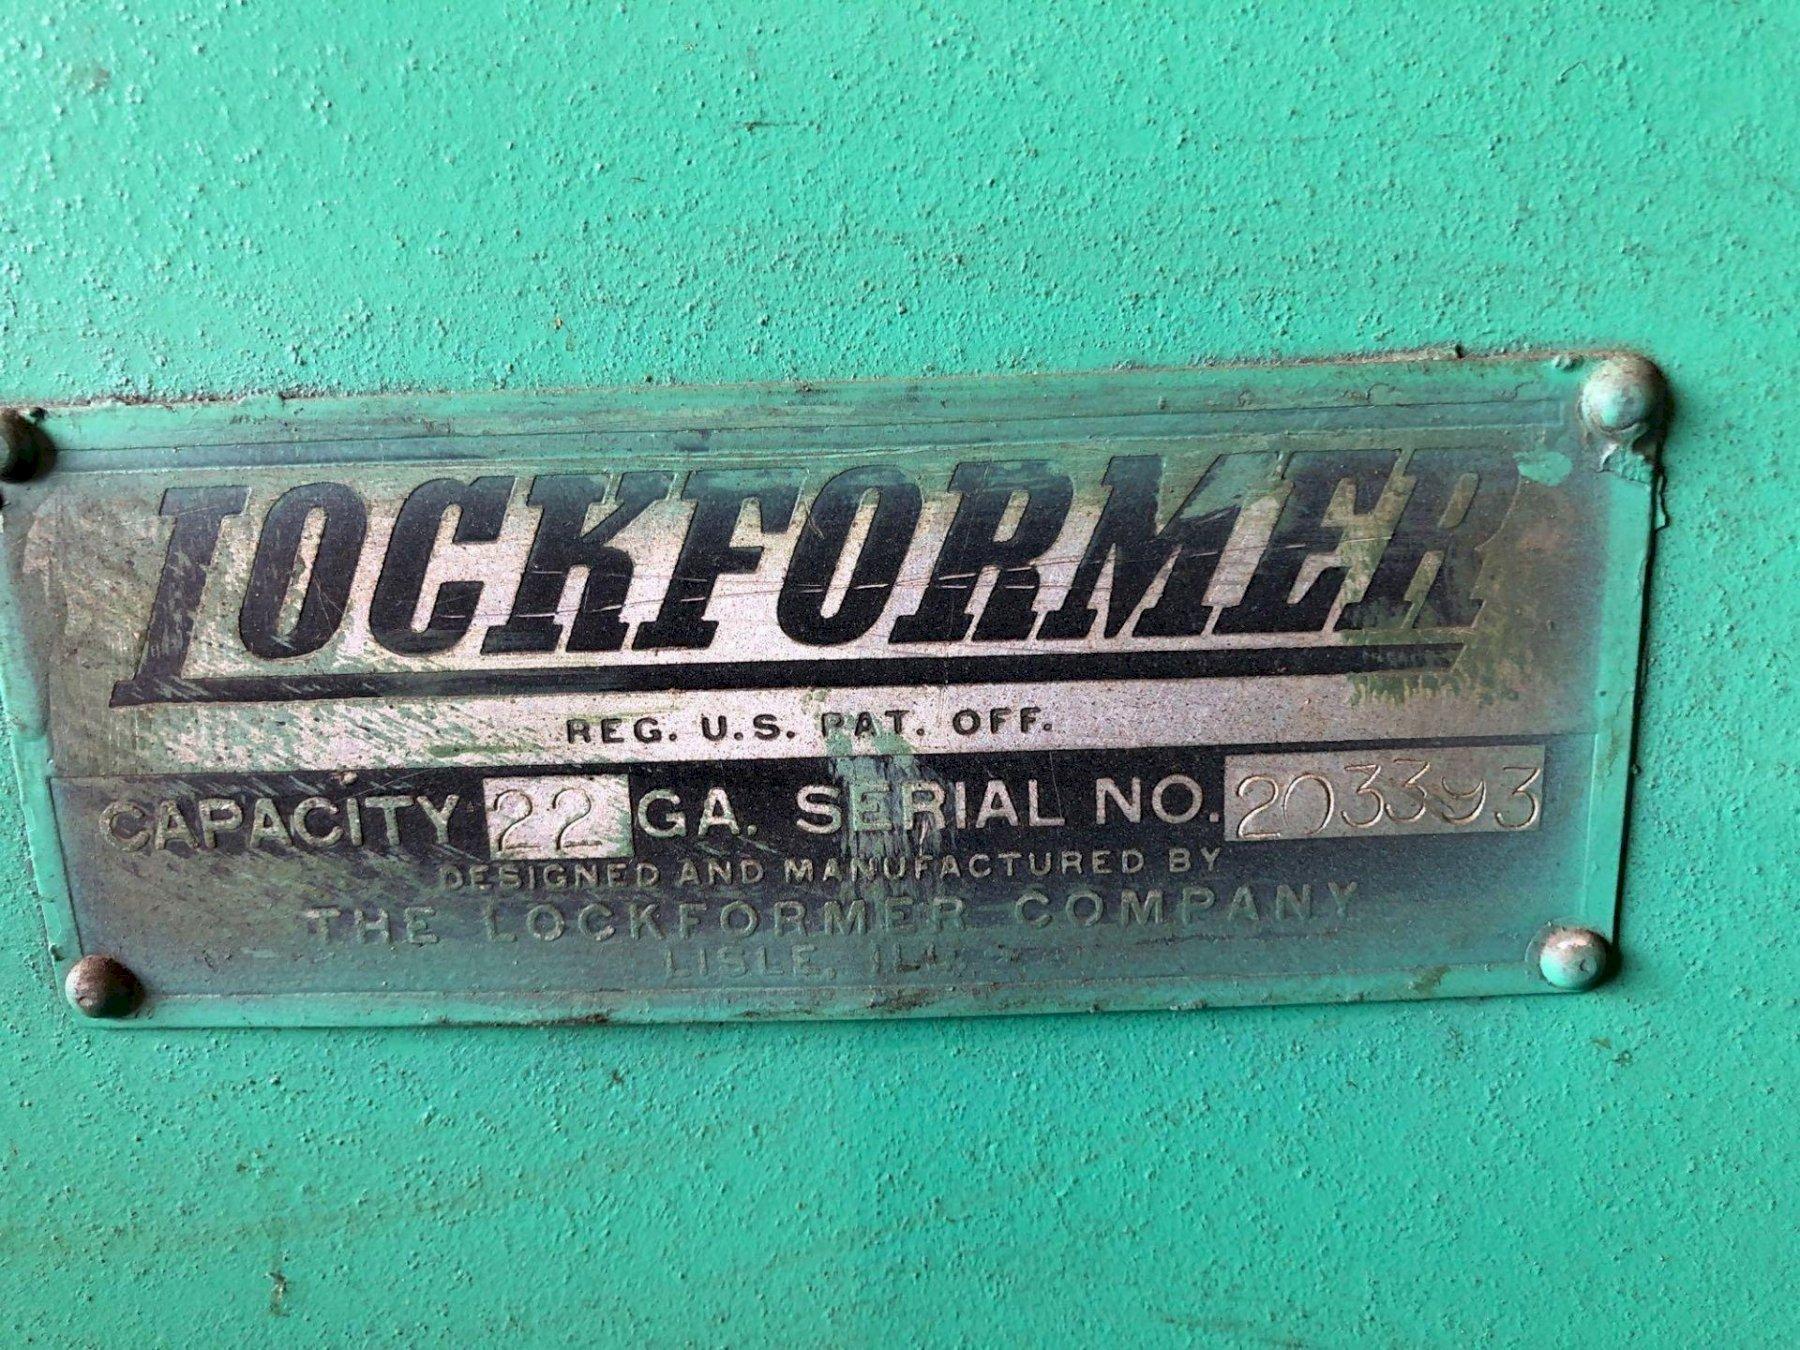 22 GA LOCKFORMER MACHINE. STOCK # 0415421